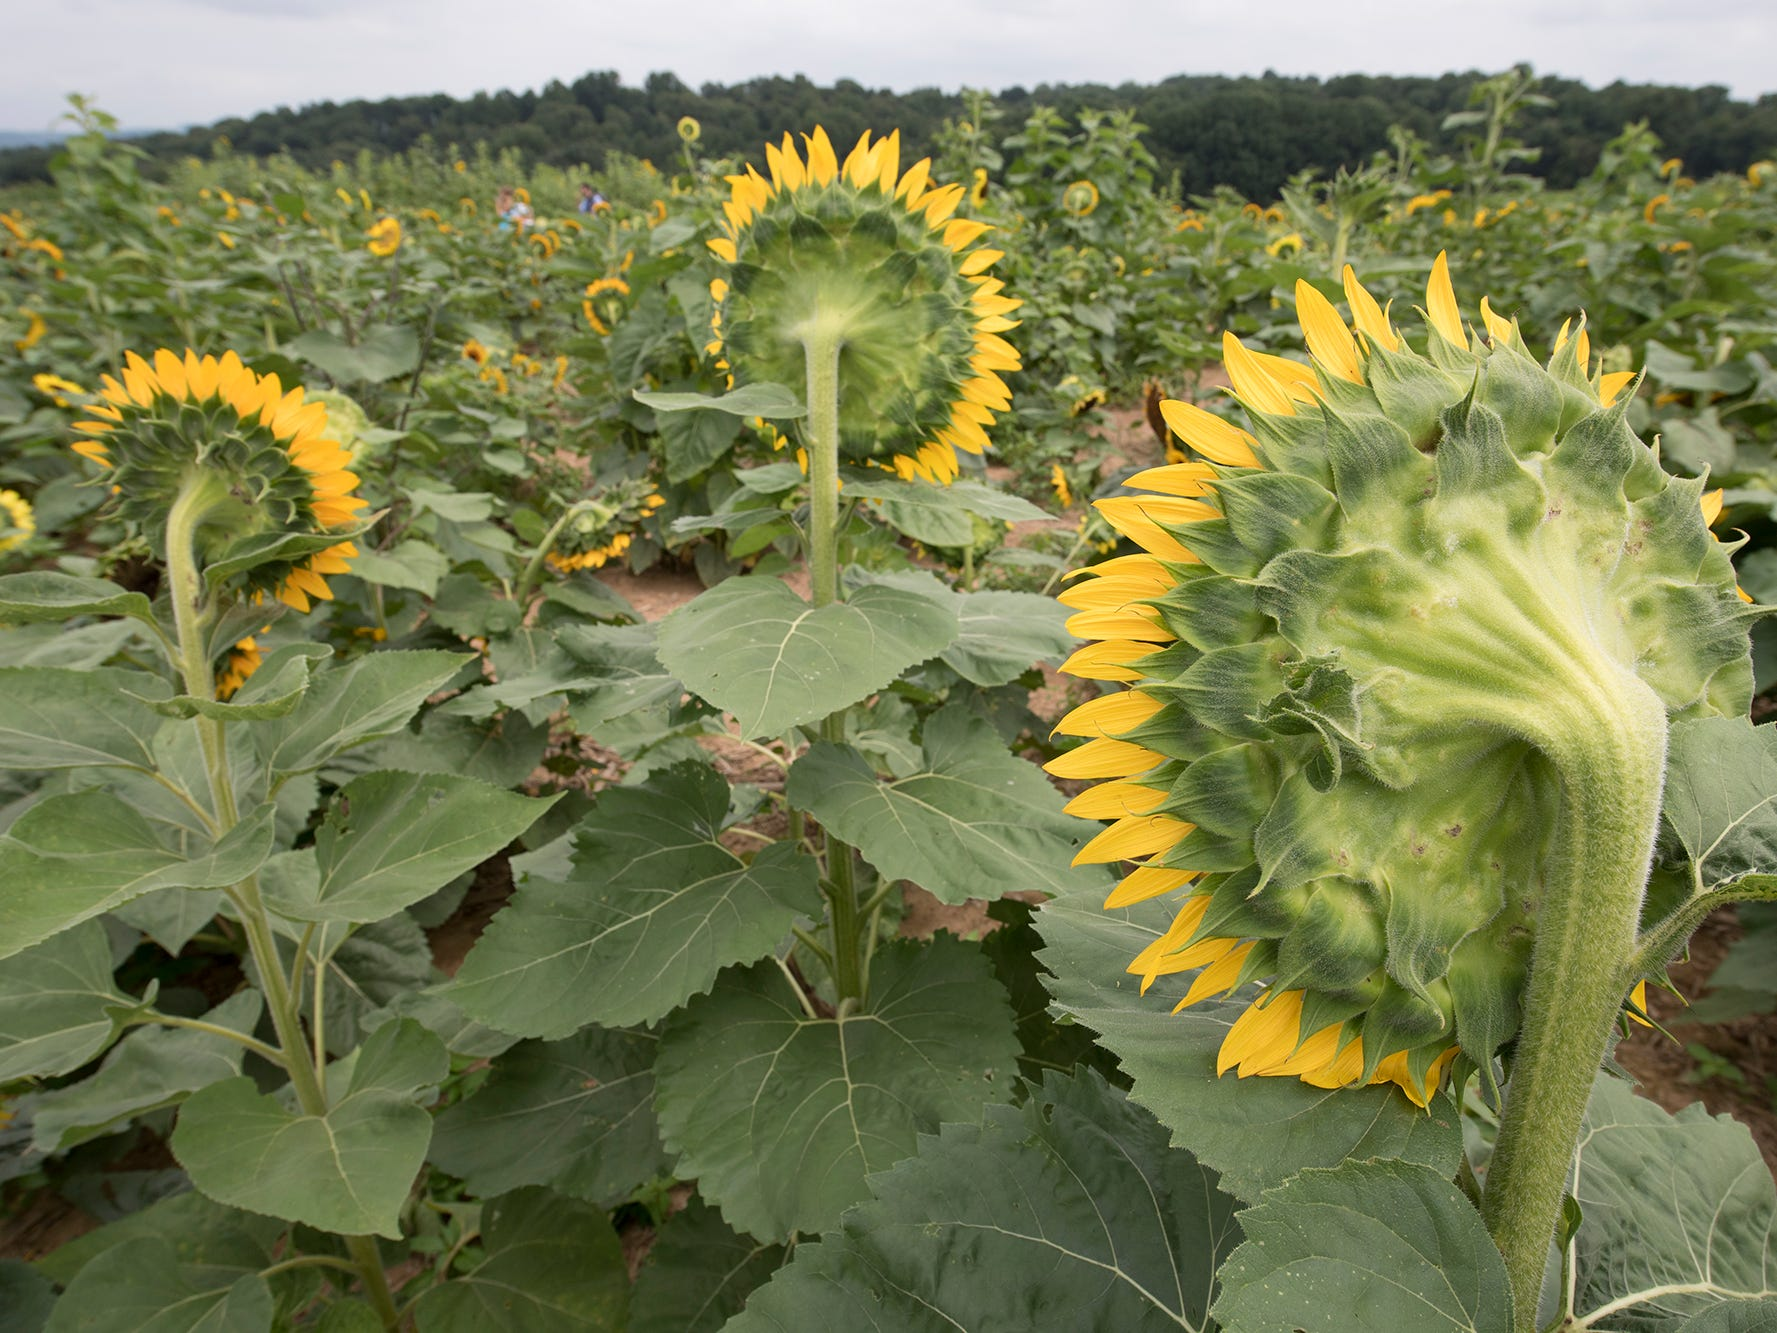 Sunflowers face toward the sun during the 2nd Annual Sunflower Festival at Maple Lawn Farms near New Park.